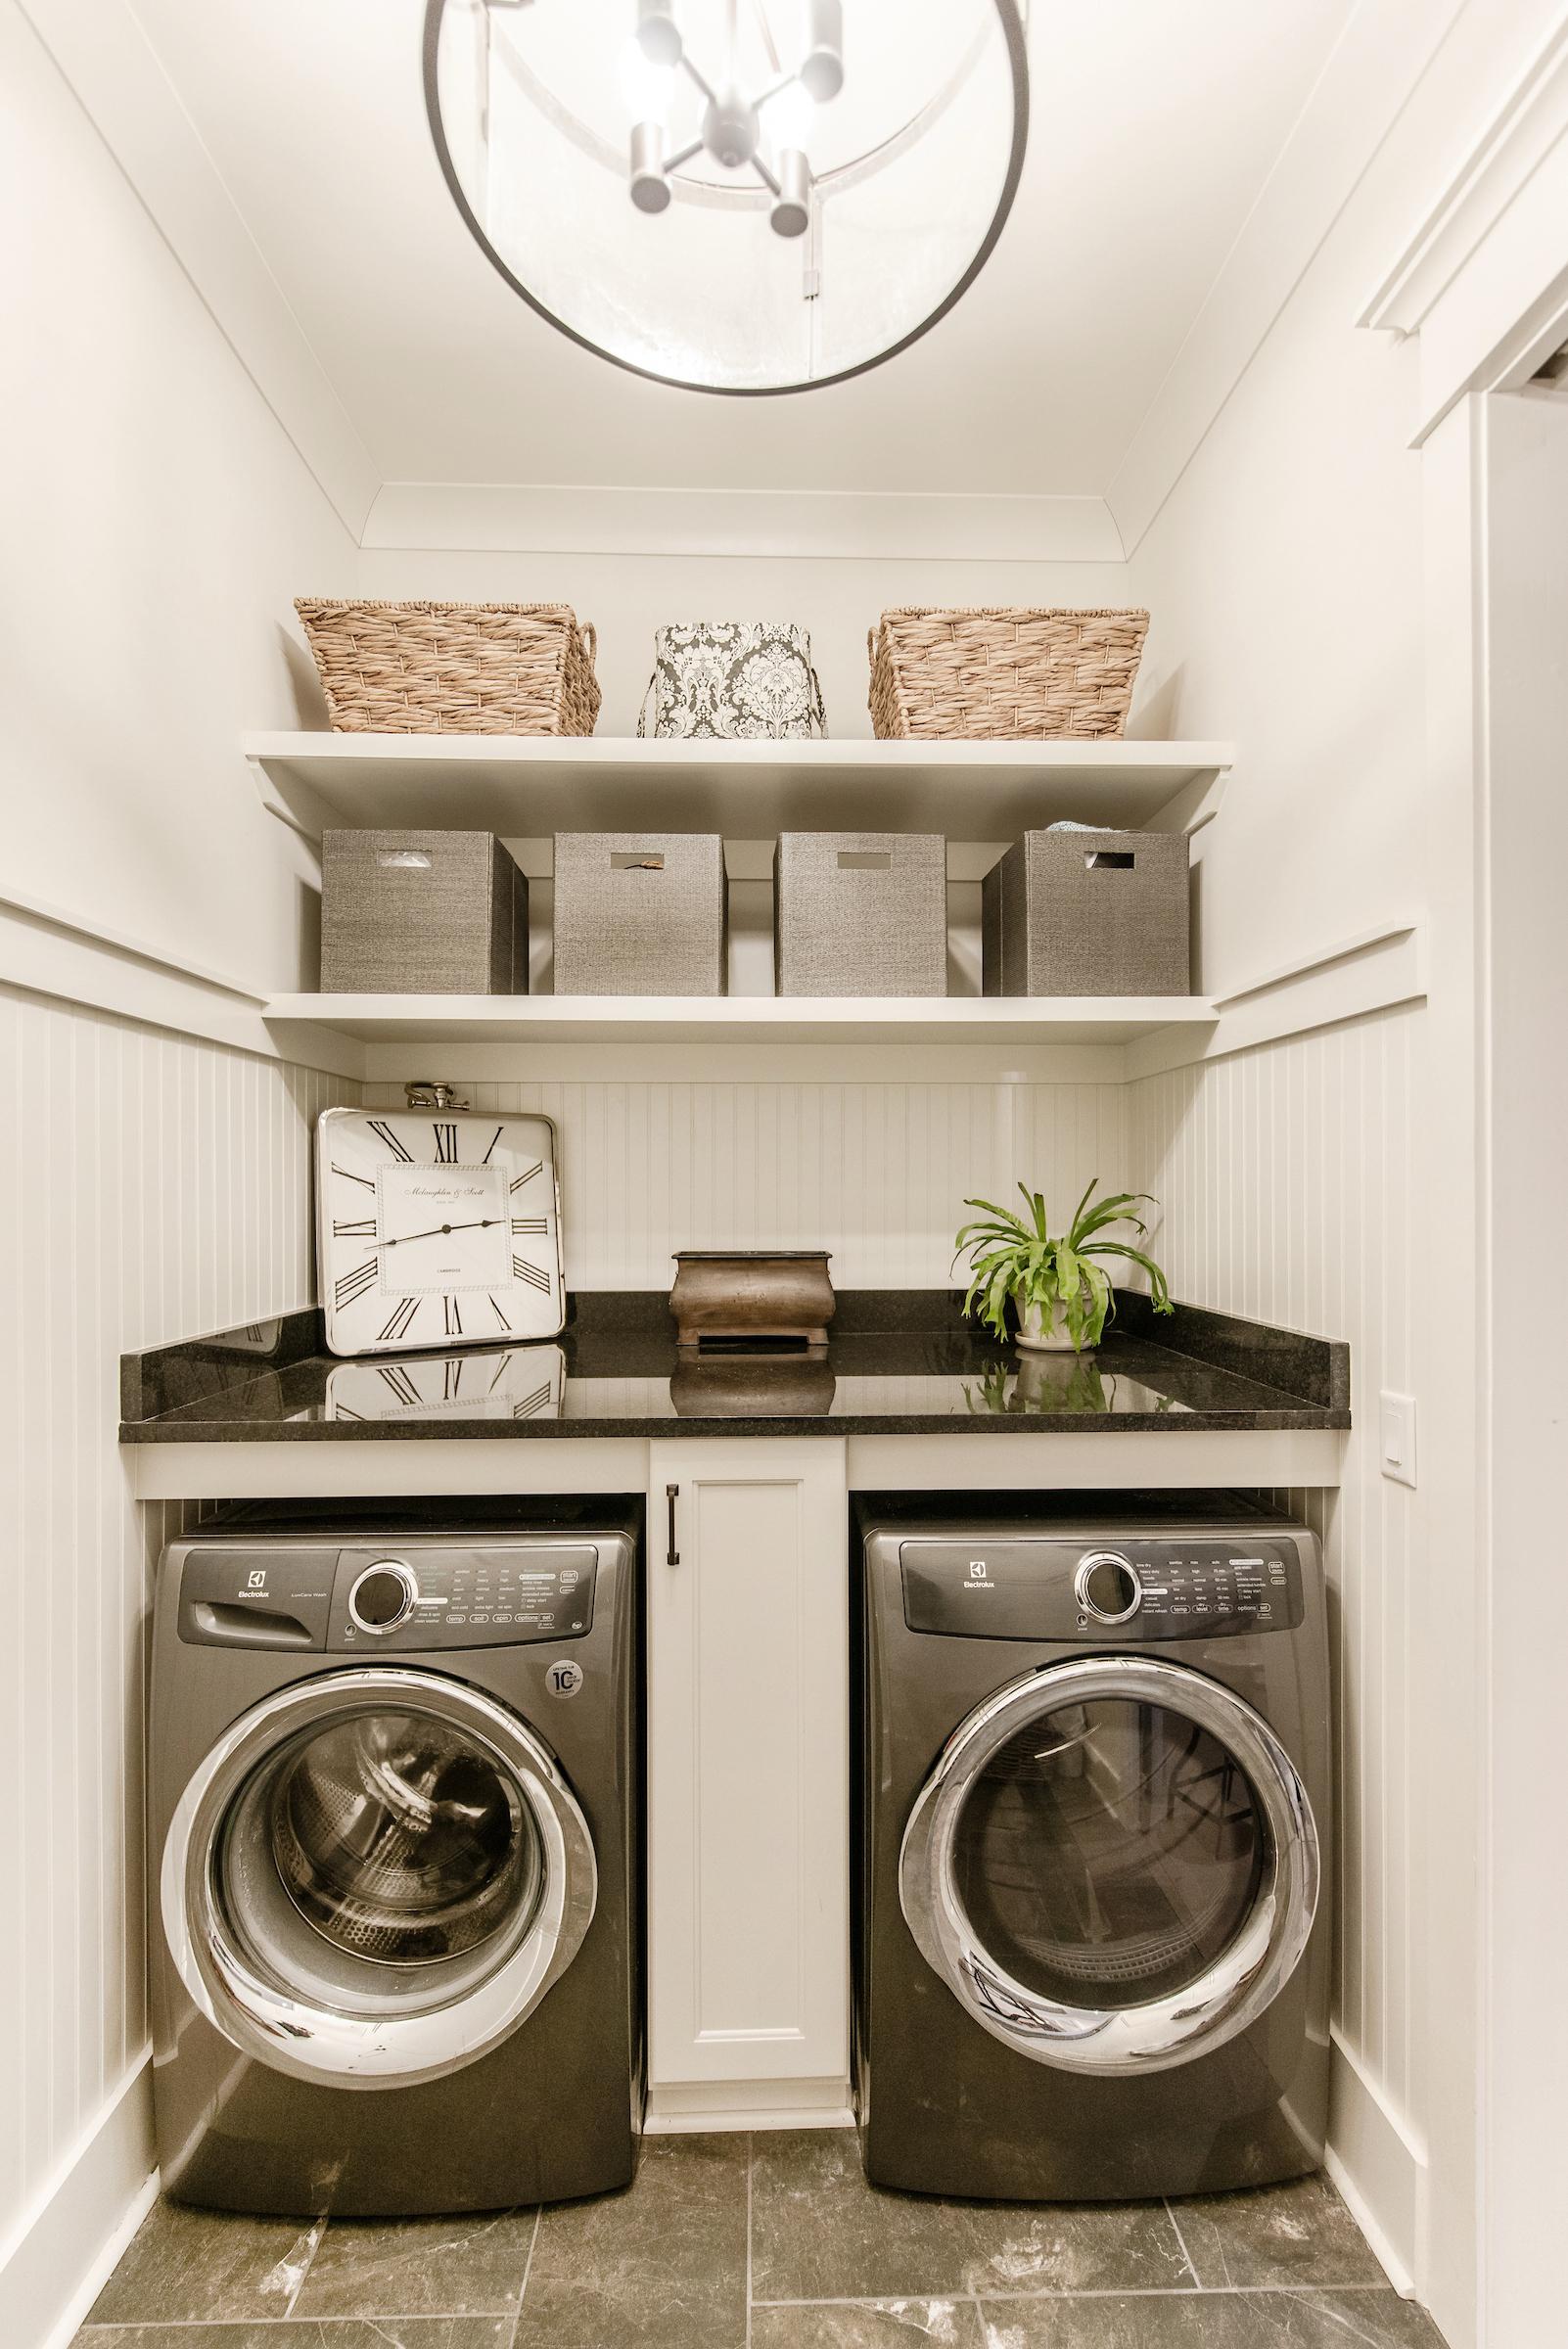 The Isle Home - Home Tour - Laundry Room